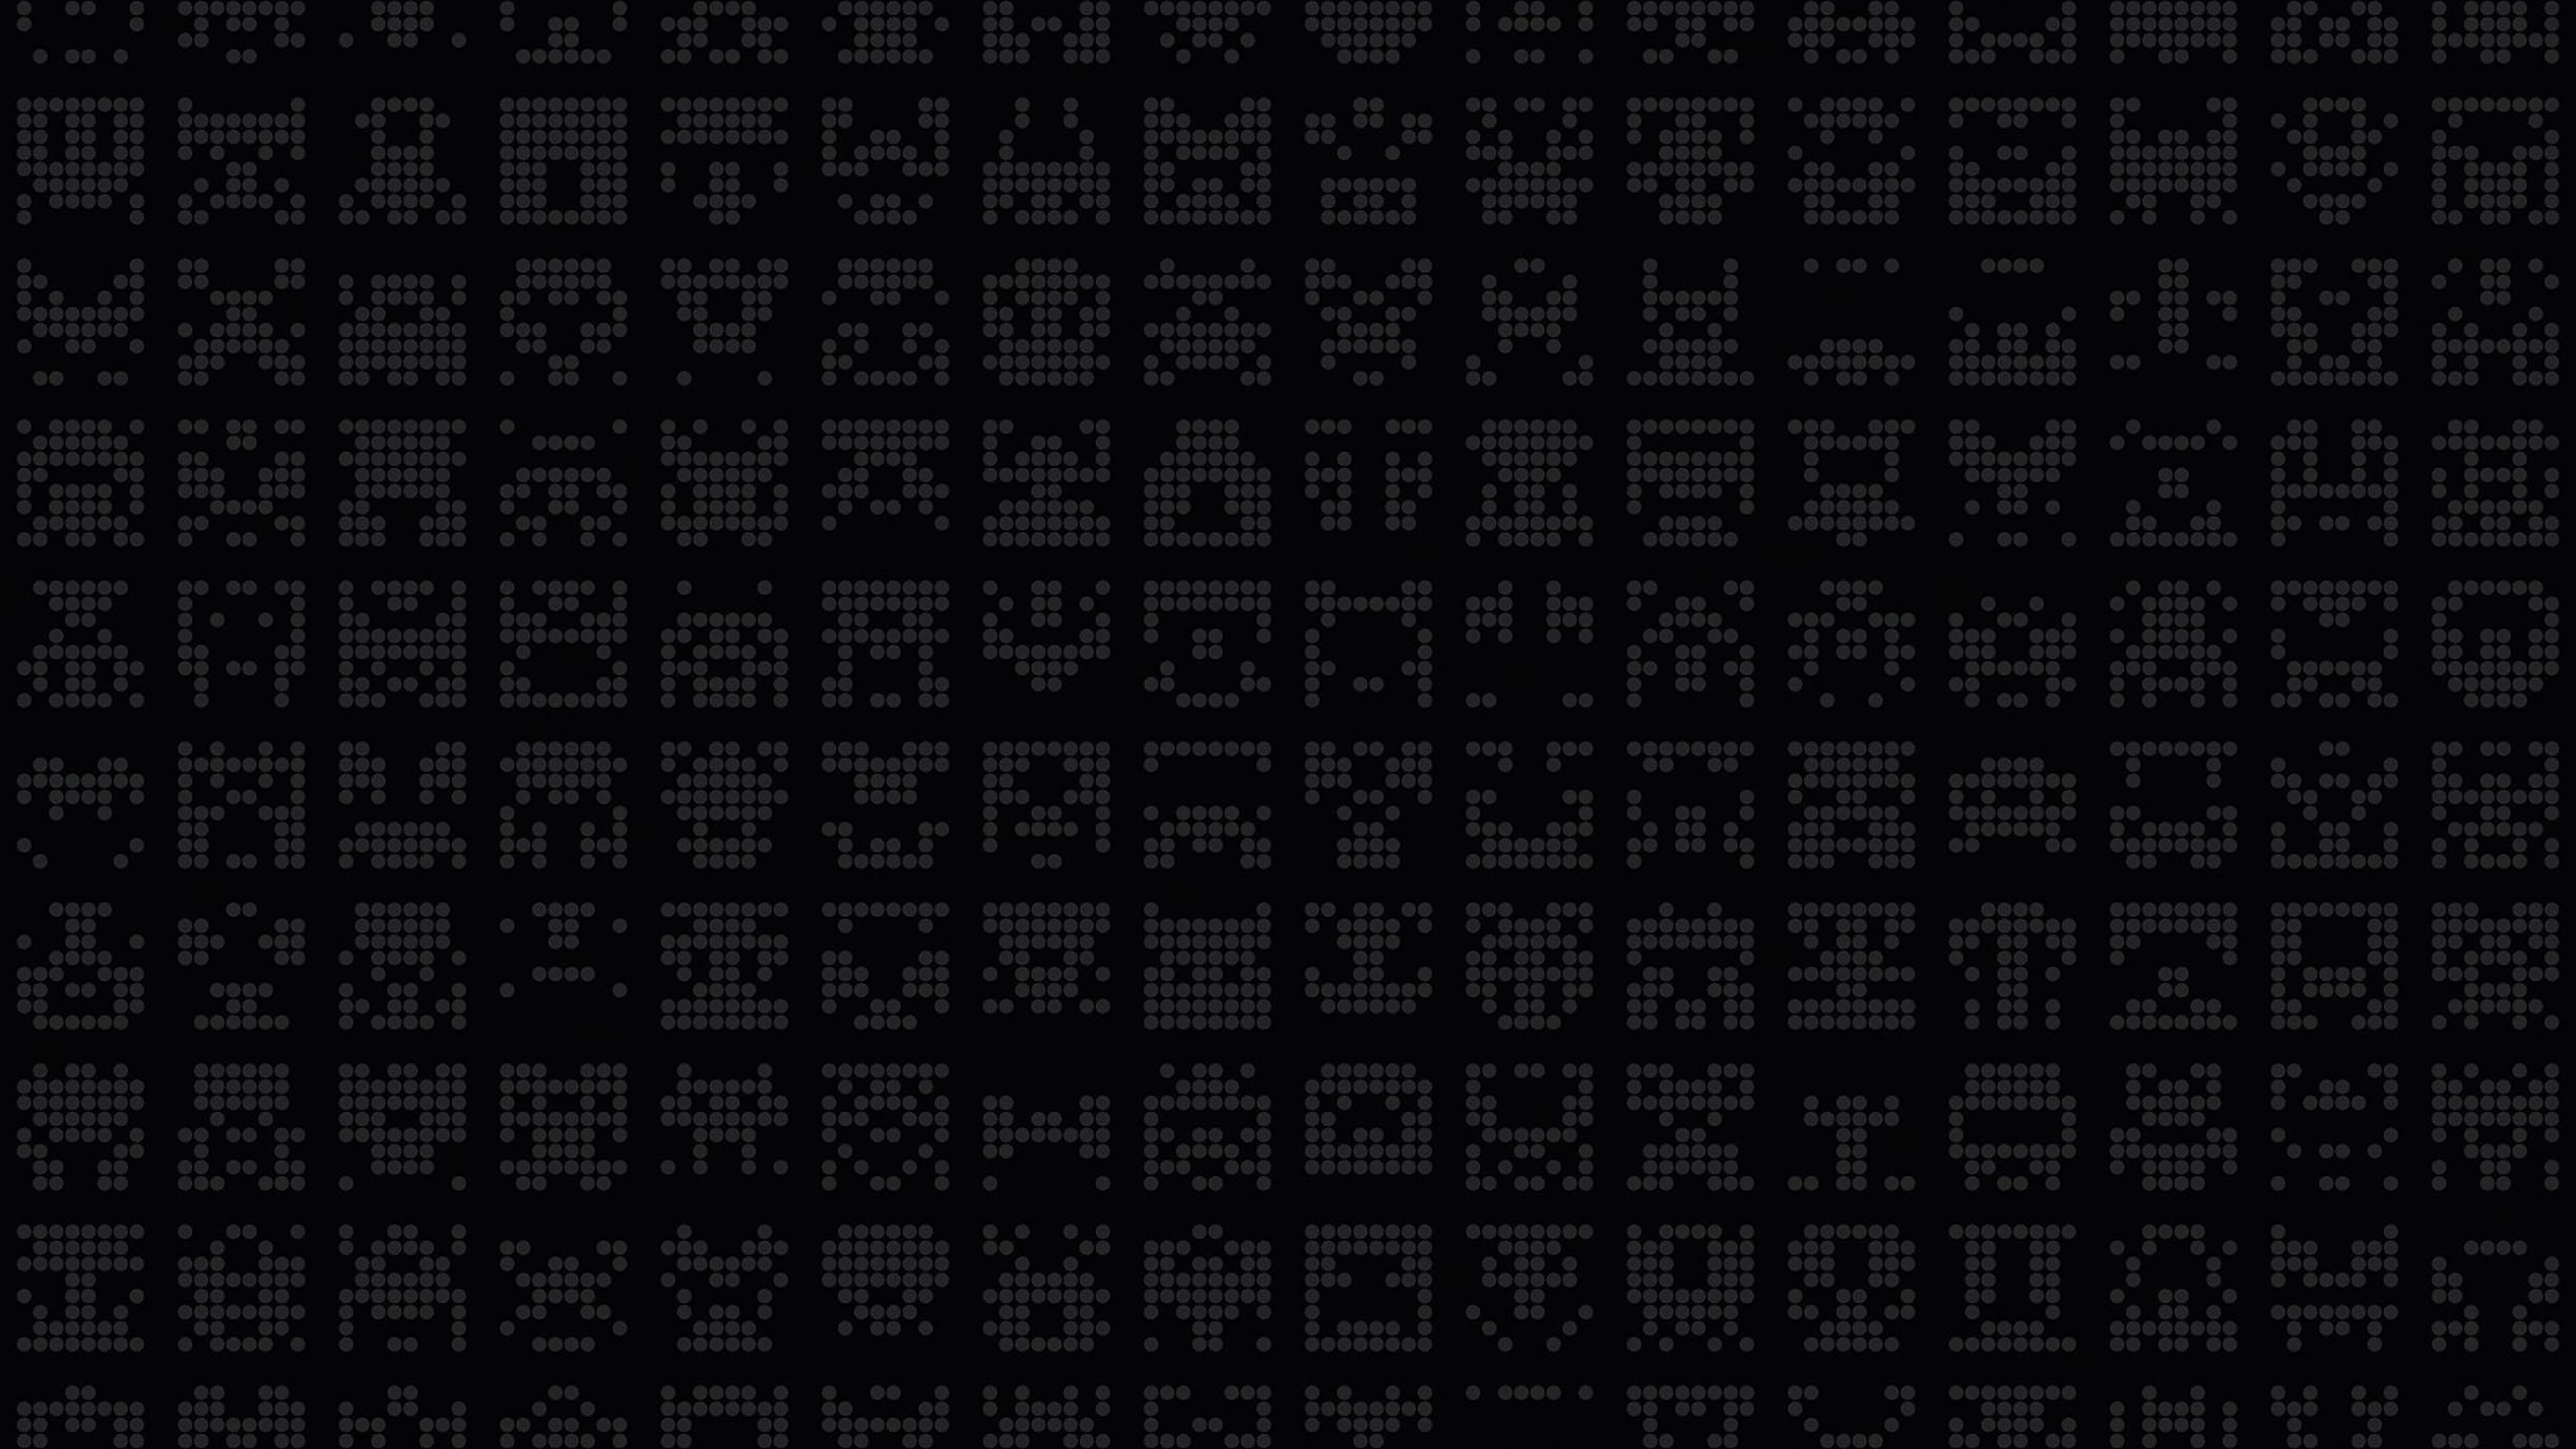 Va22 Alien Symbol Dark Pattern Papers